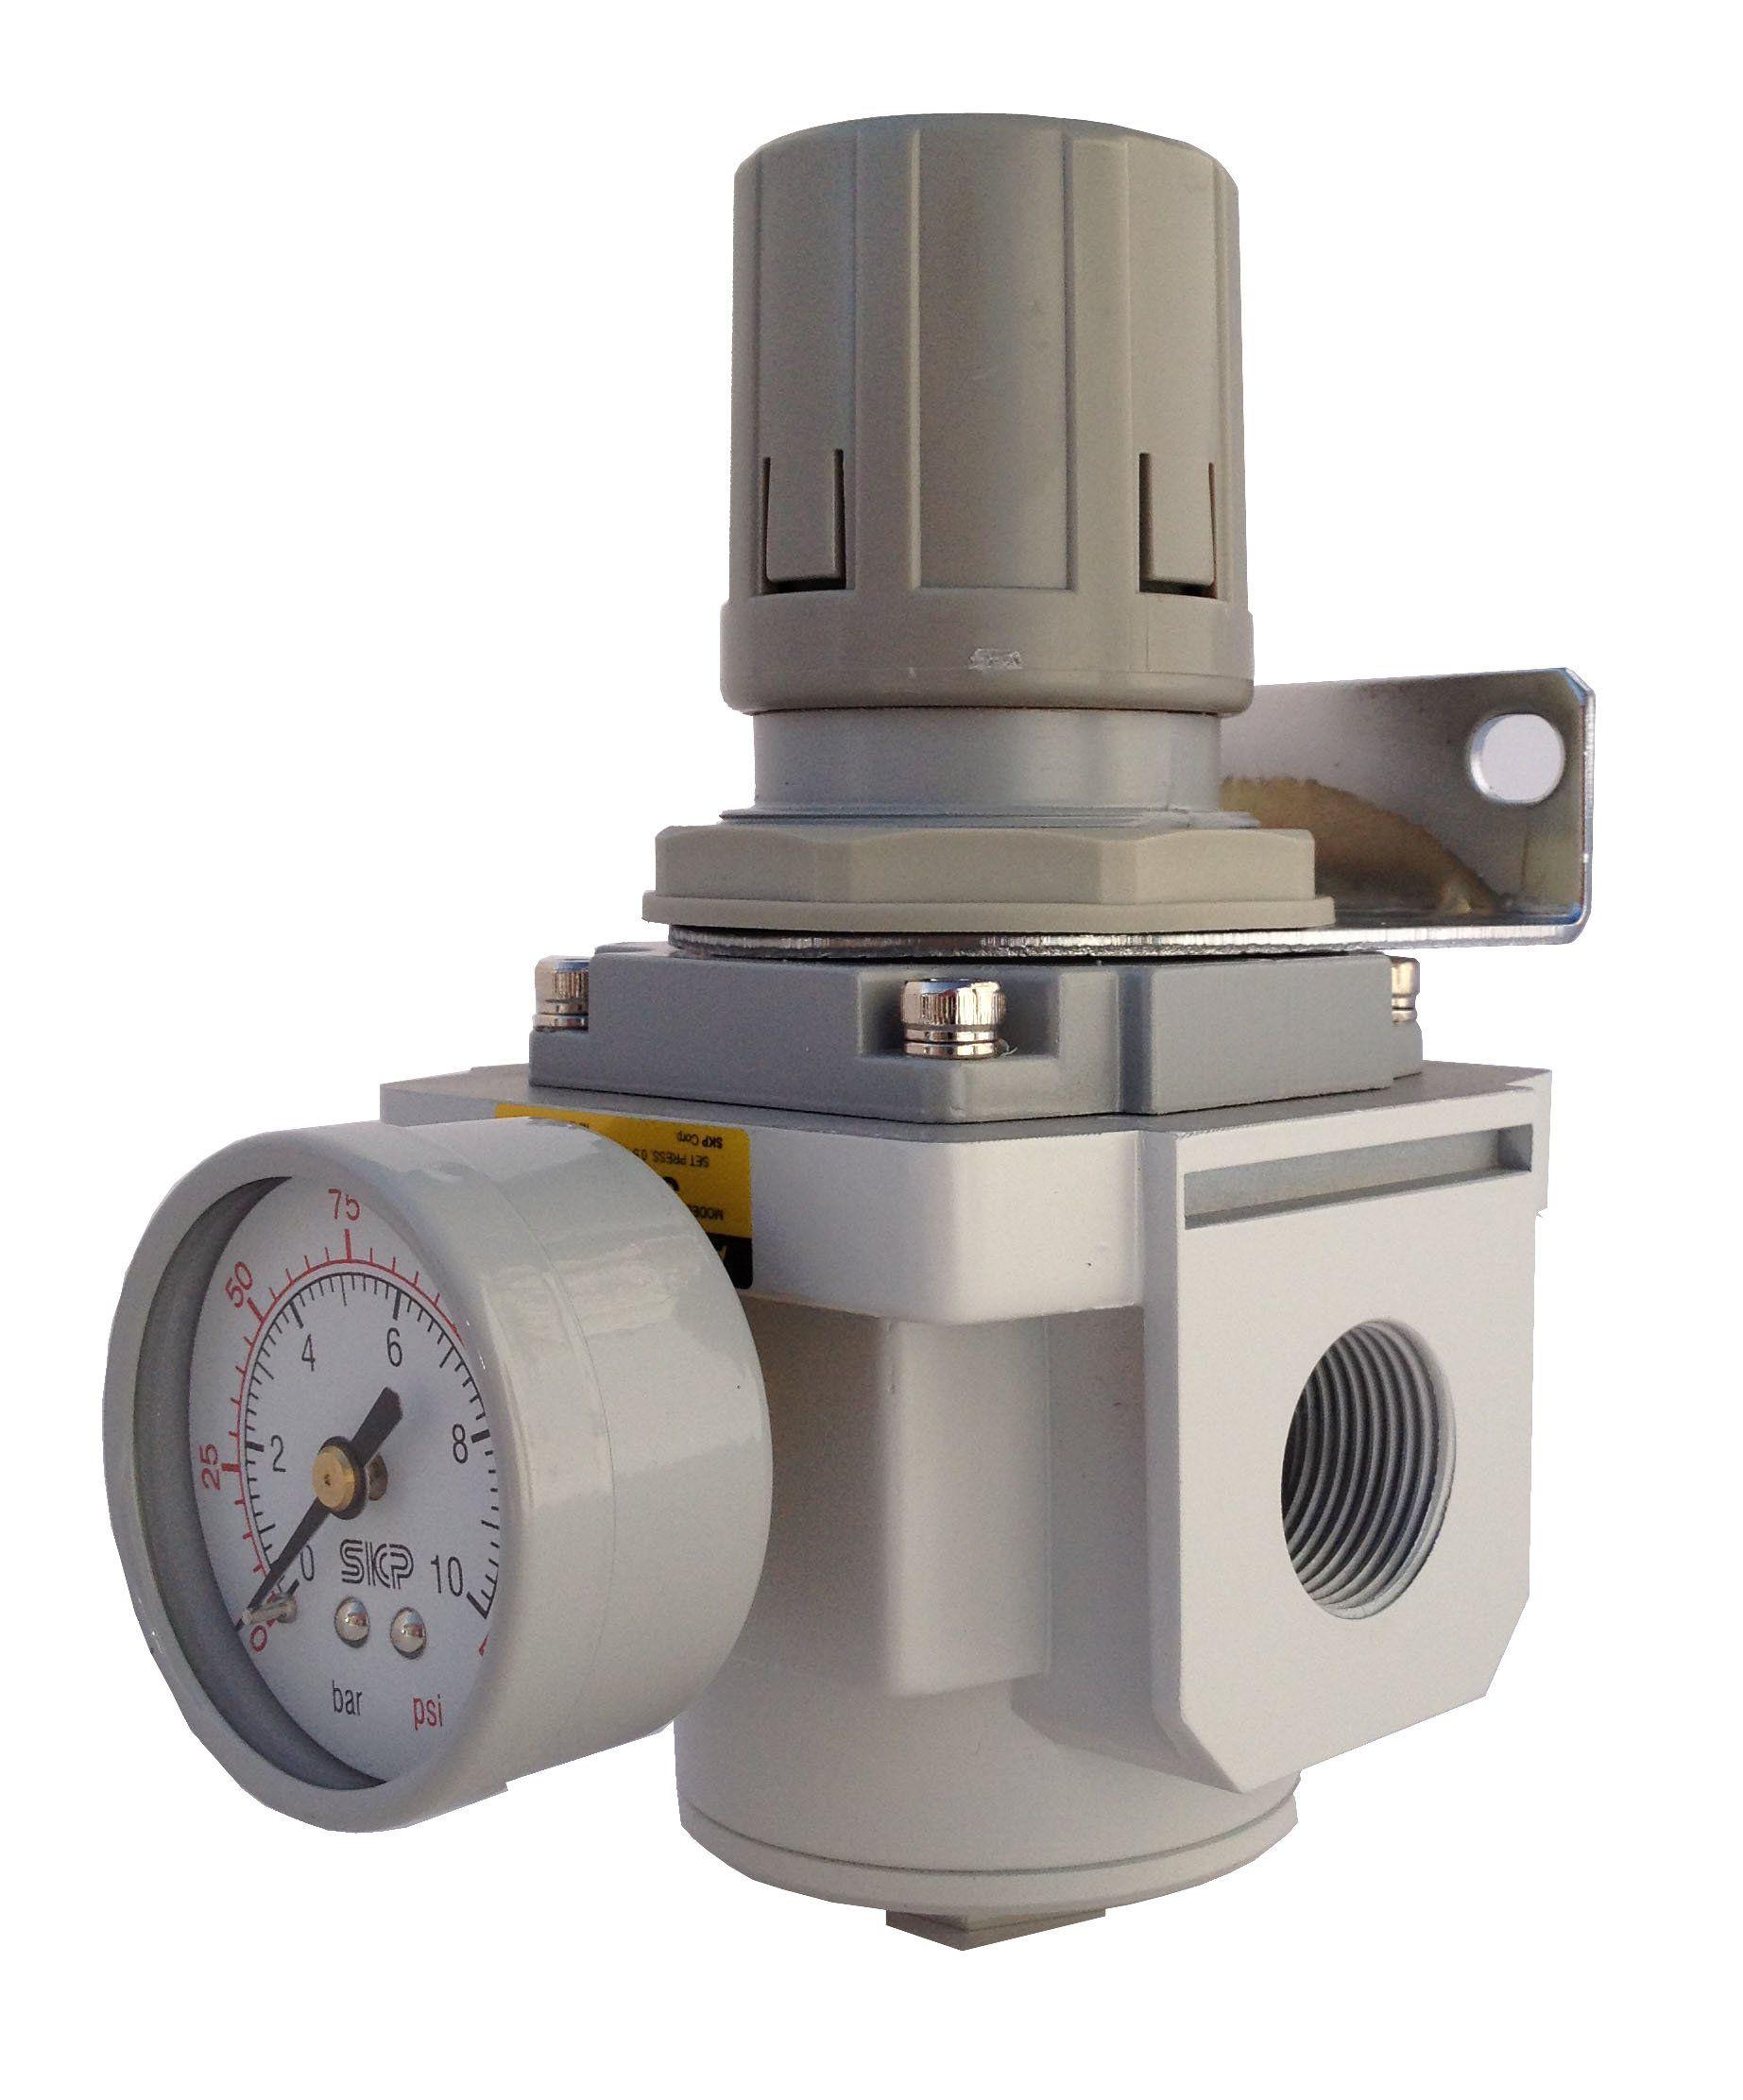 Pneumaticplus Sar6000mn10bg Air Pressure Regulator 1 Npt With Gauge And Bracket Visit The Image Link More Details This Is Air Pressure Pressure Regulators